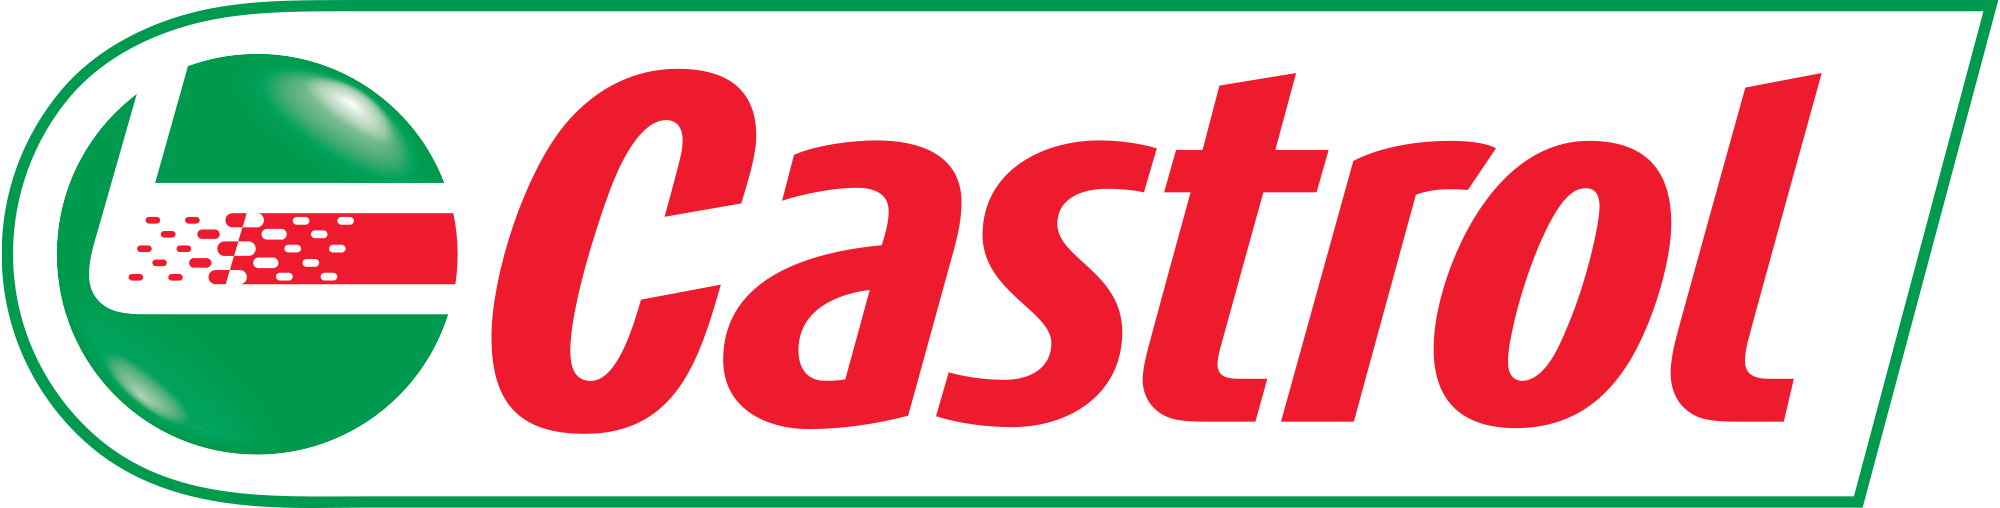 castrol logo 4 - Castrol Logo